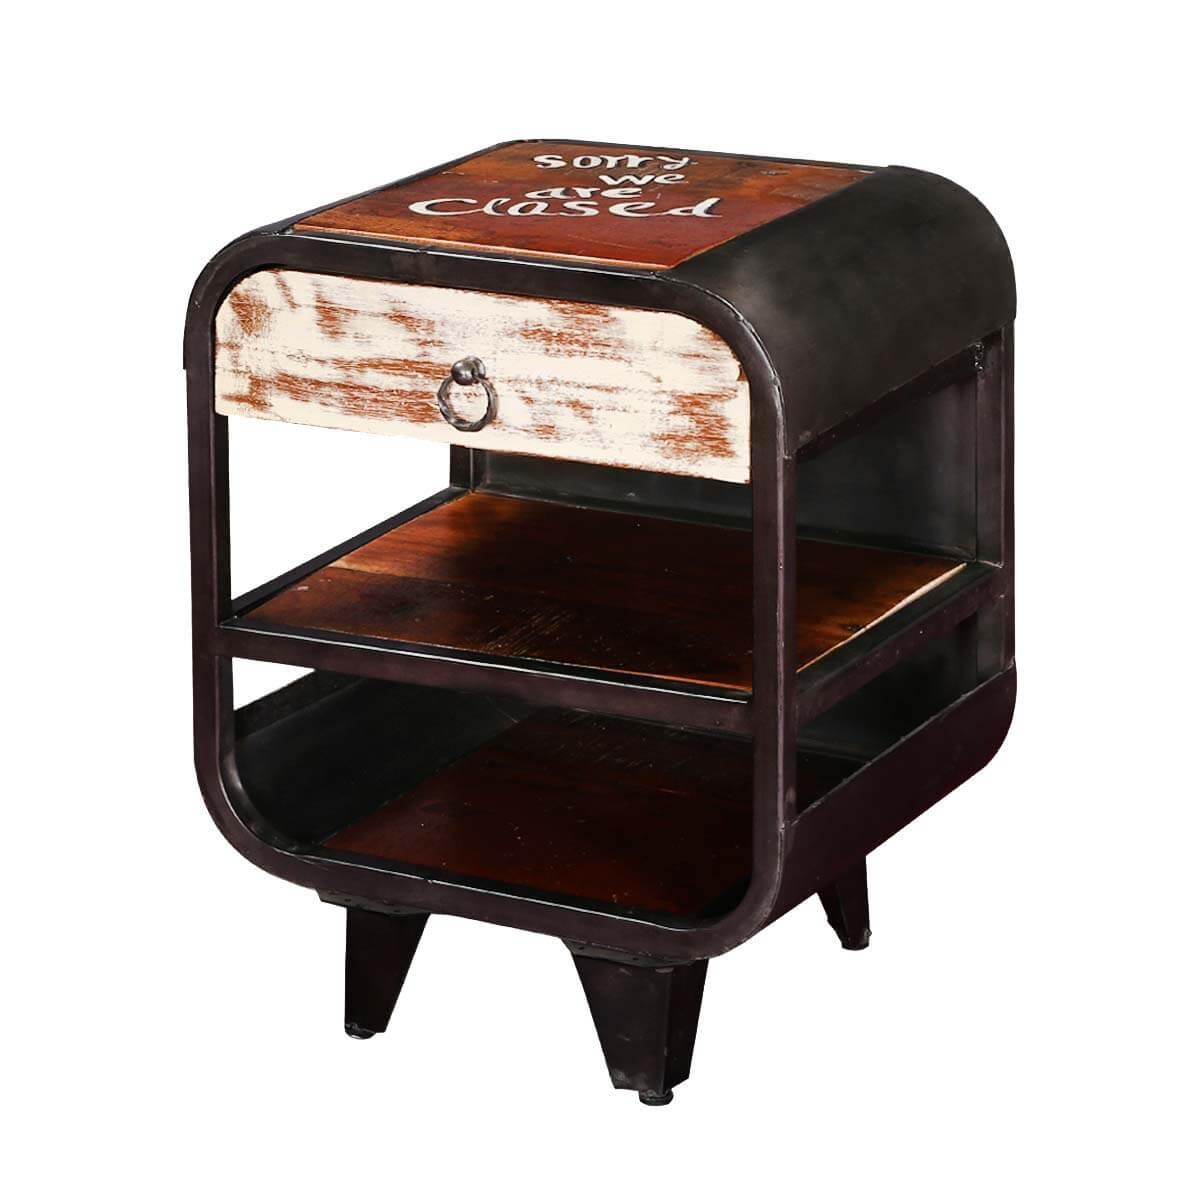 Philadelphia Retro 2 shelves Iron and Mango Wood Accent Nightstand